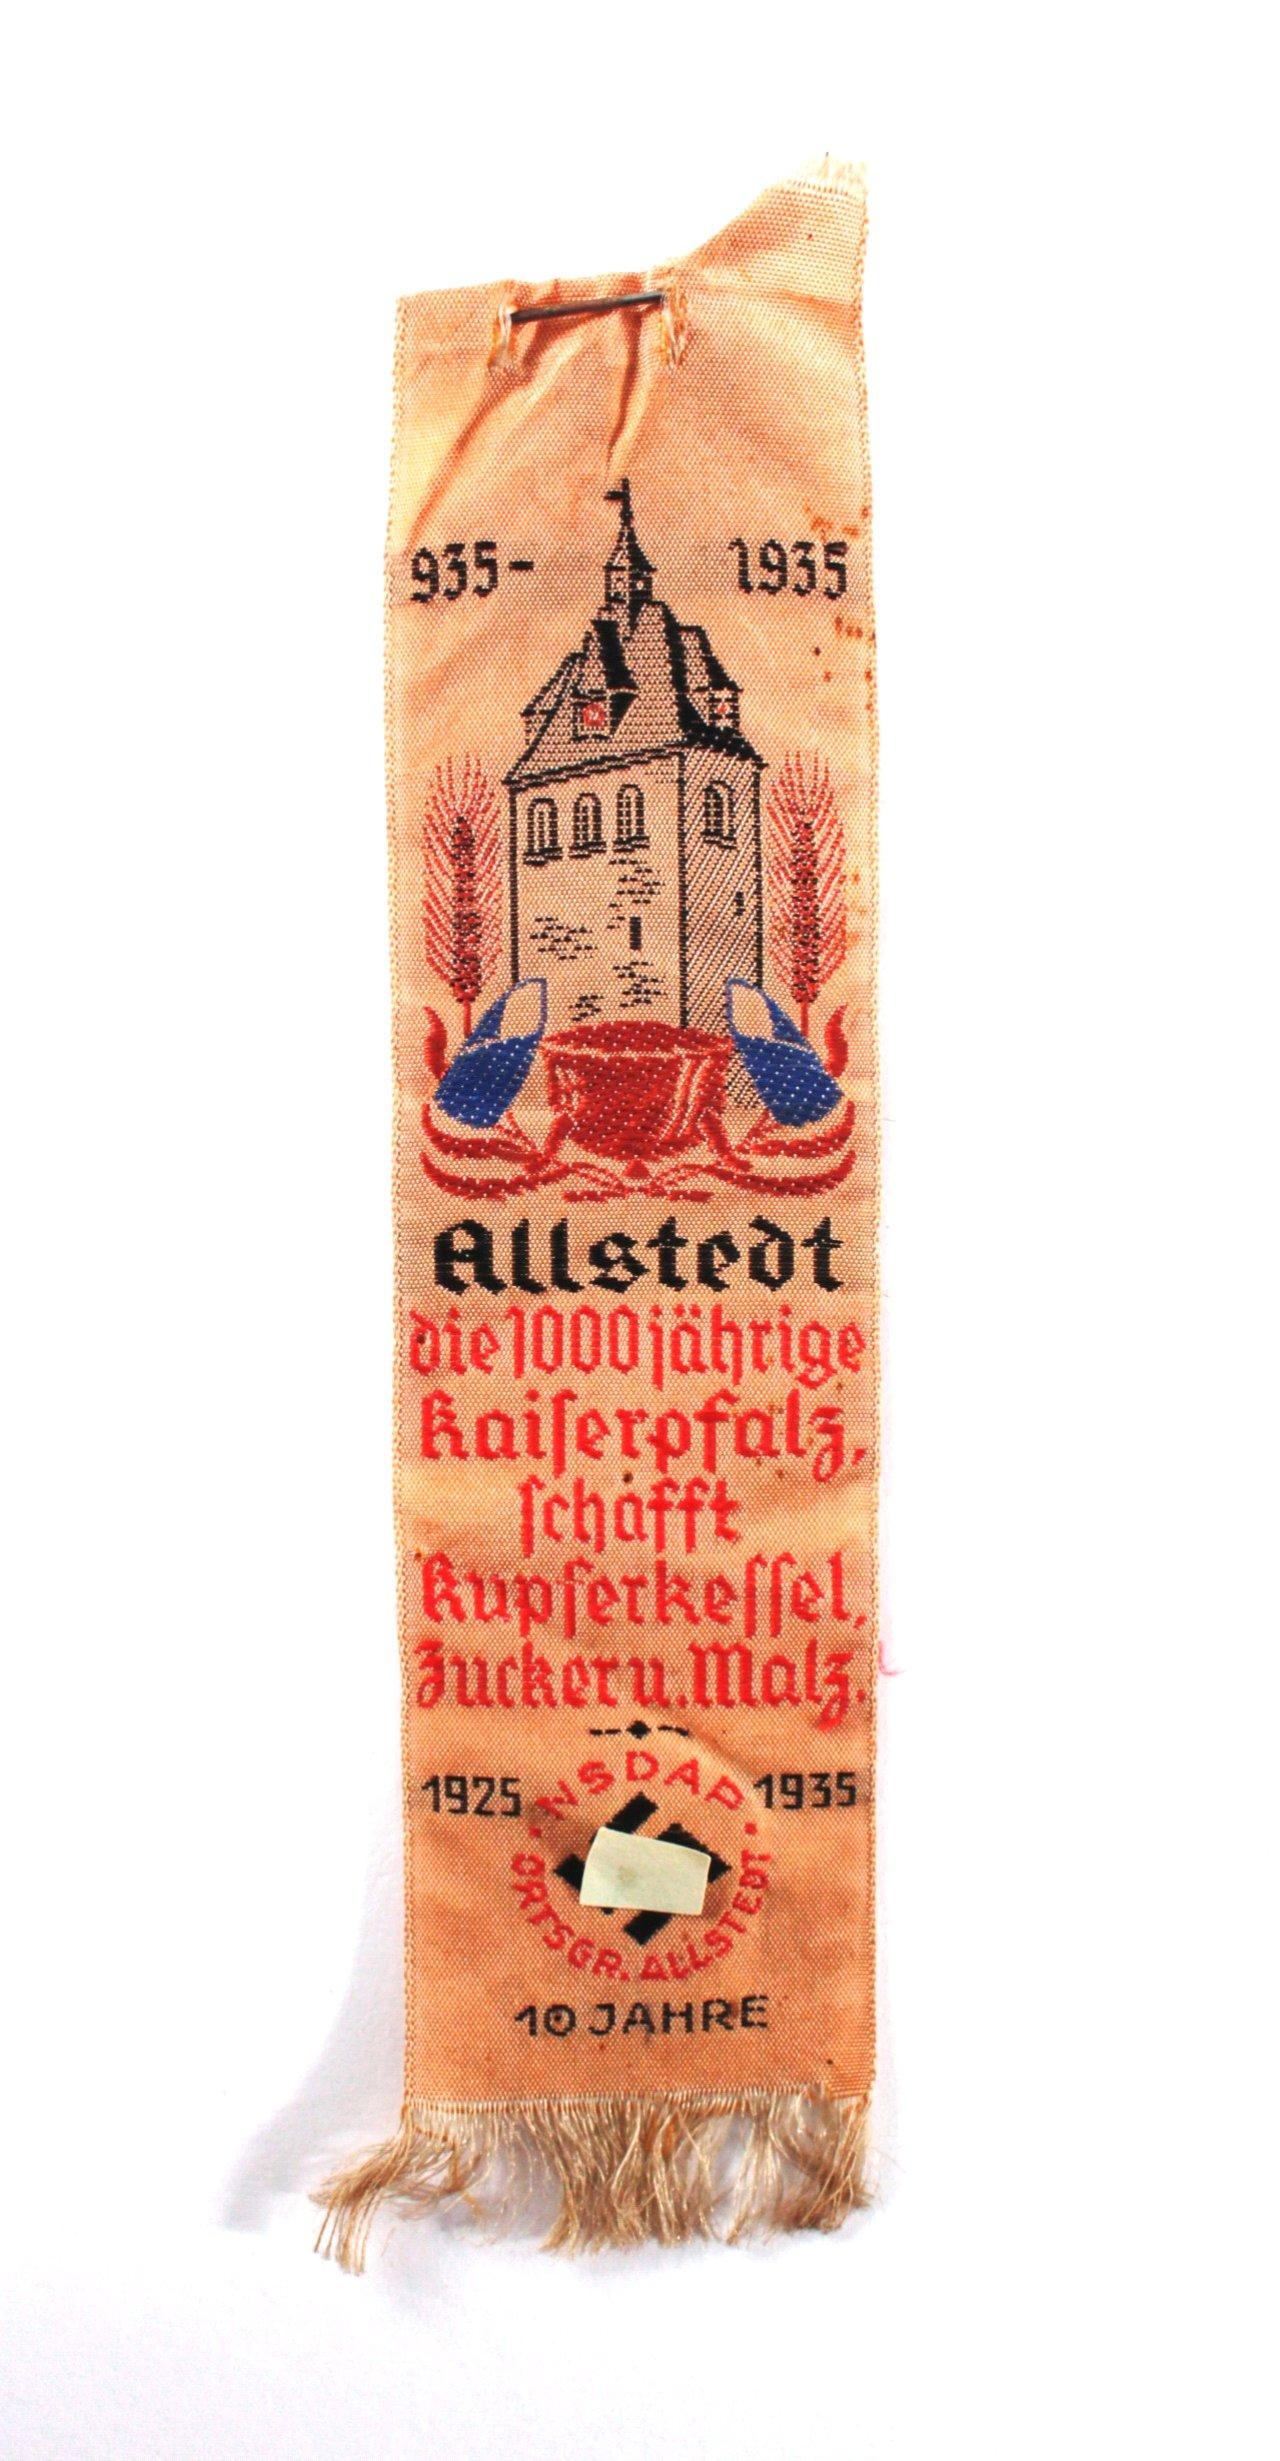 Seidenband, 1000 jährige Kaiserpfalz, Allstedt 1935